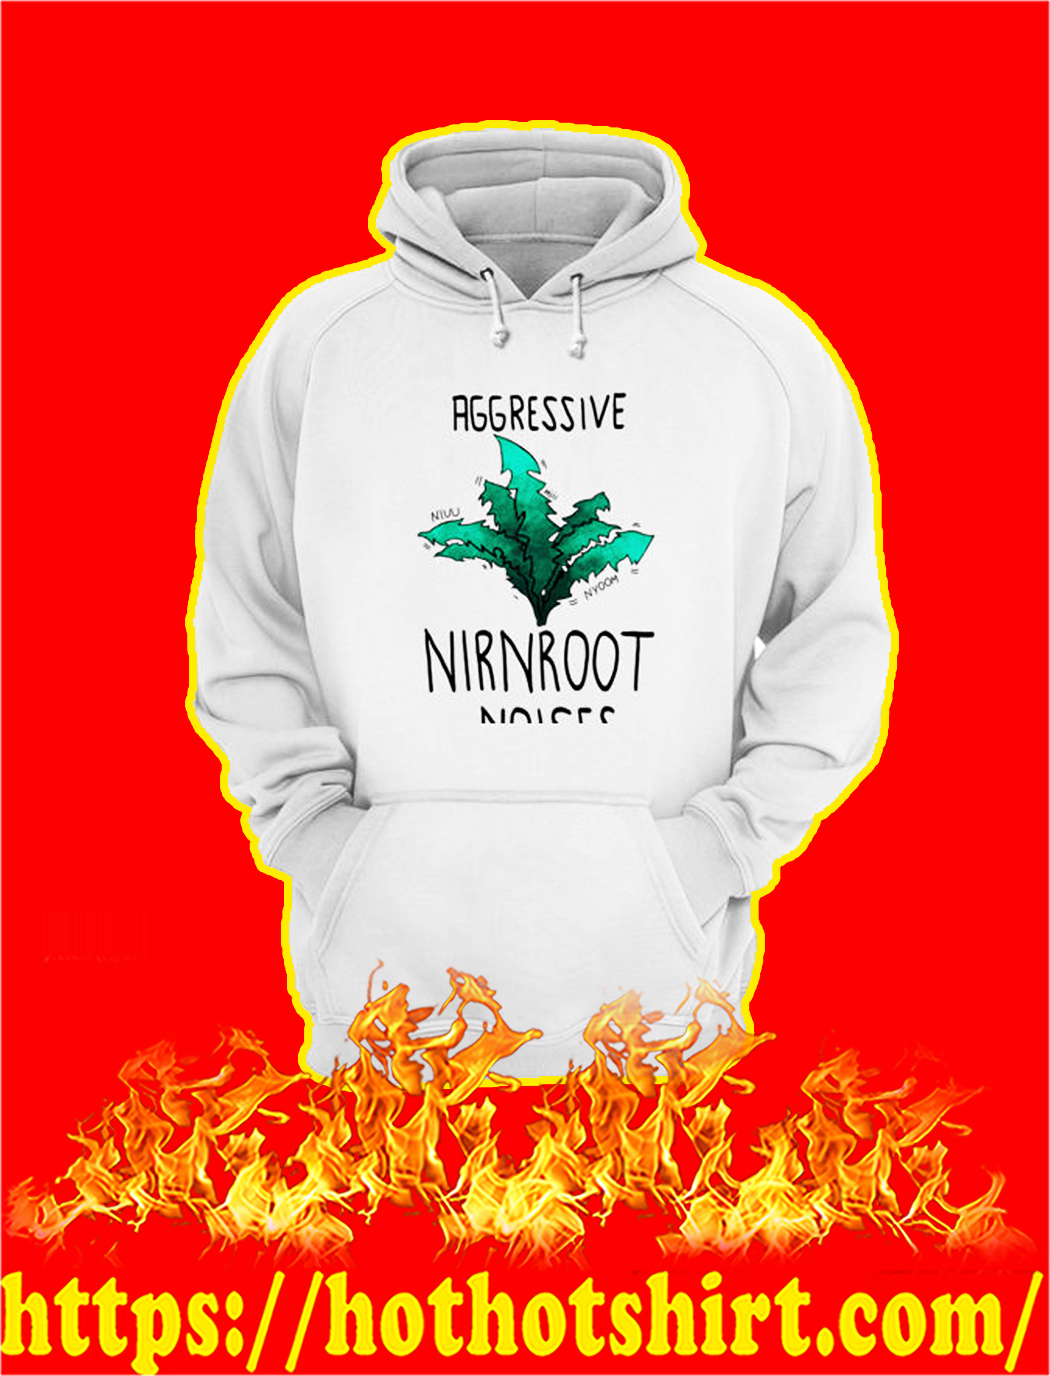 Aggressive Nirnroot Noises hoodie